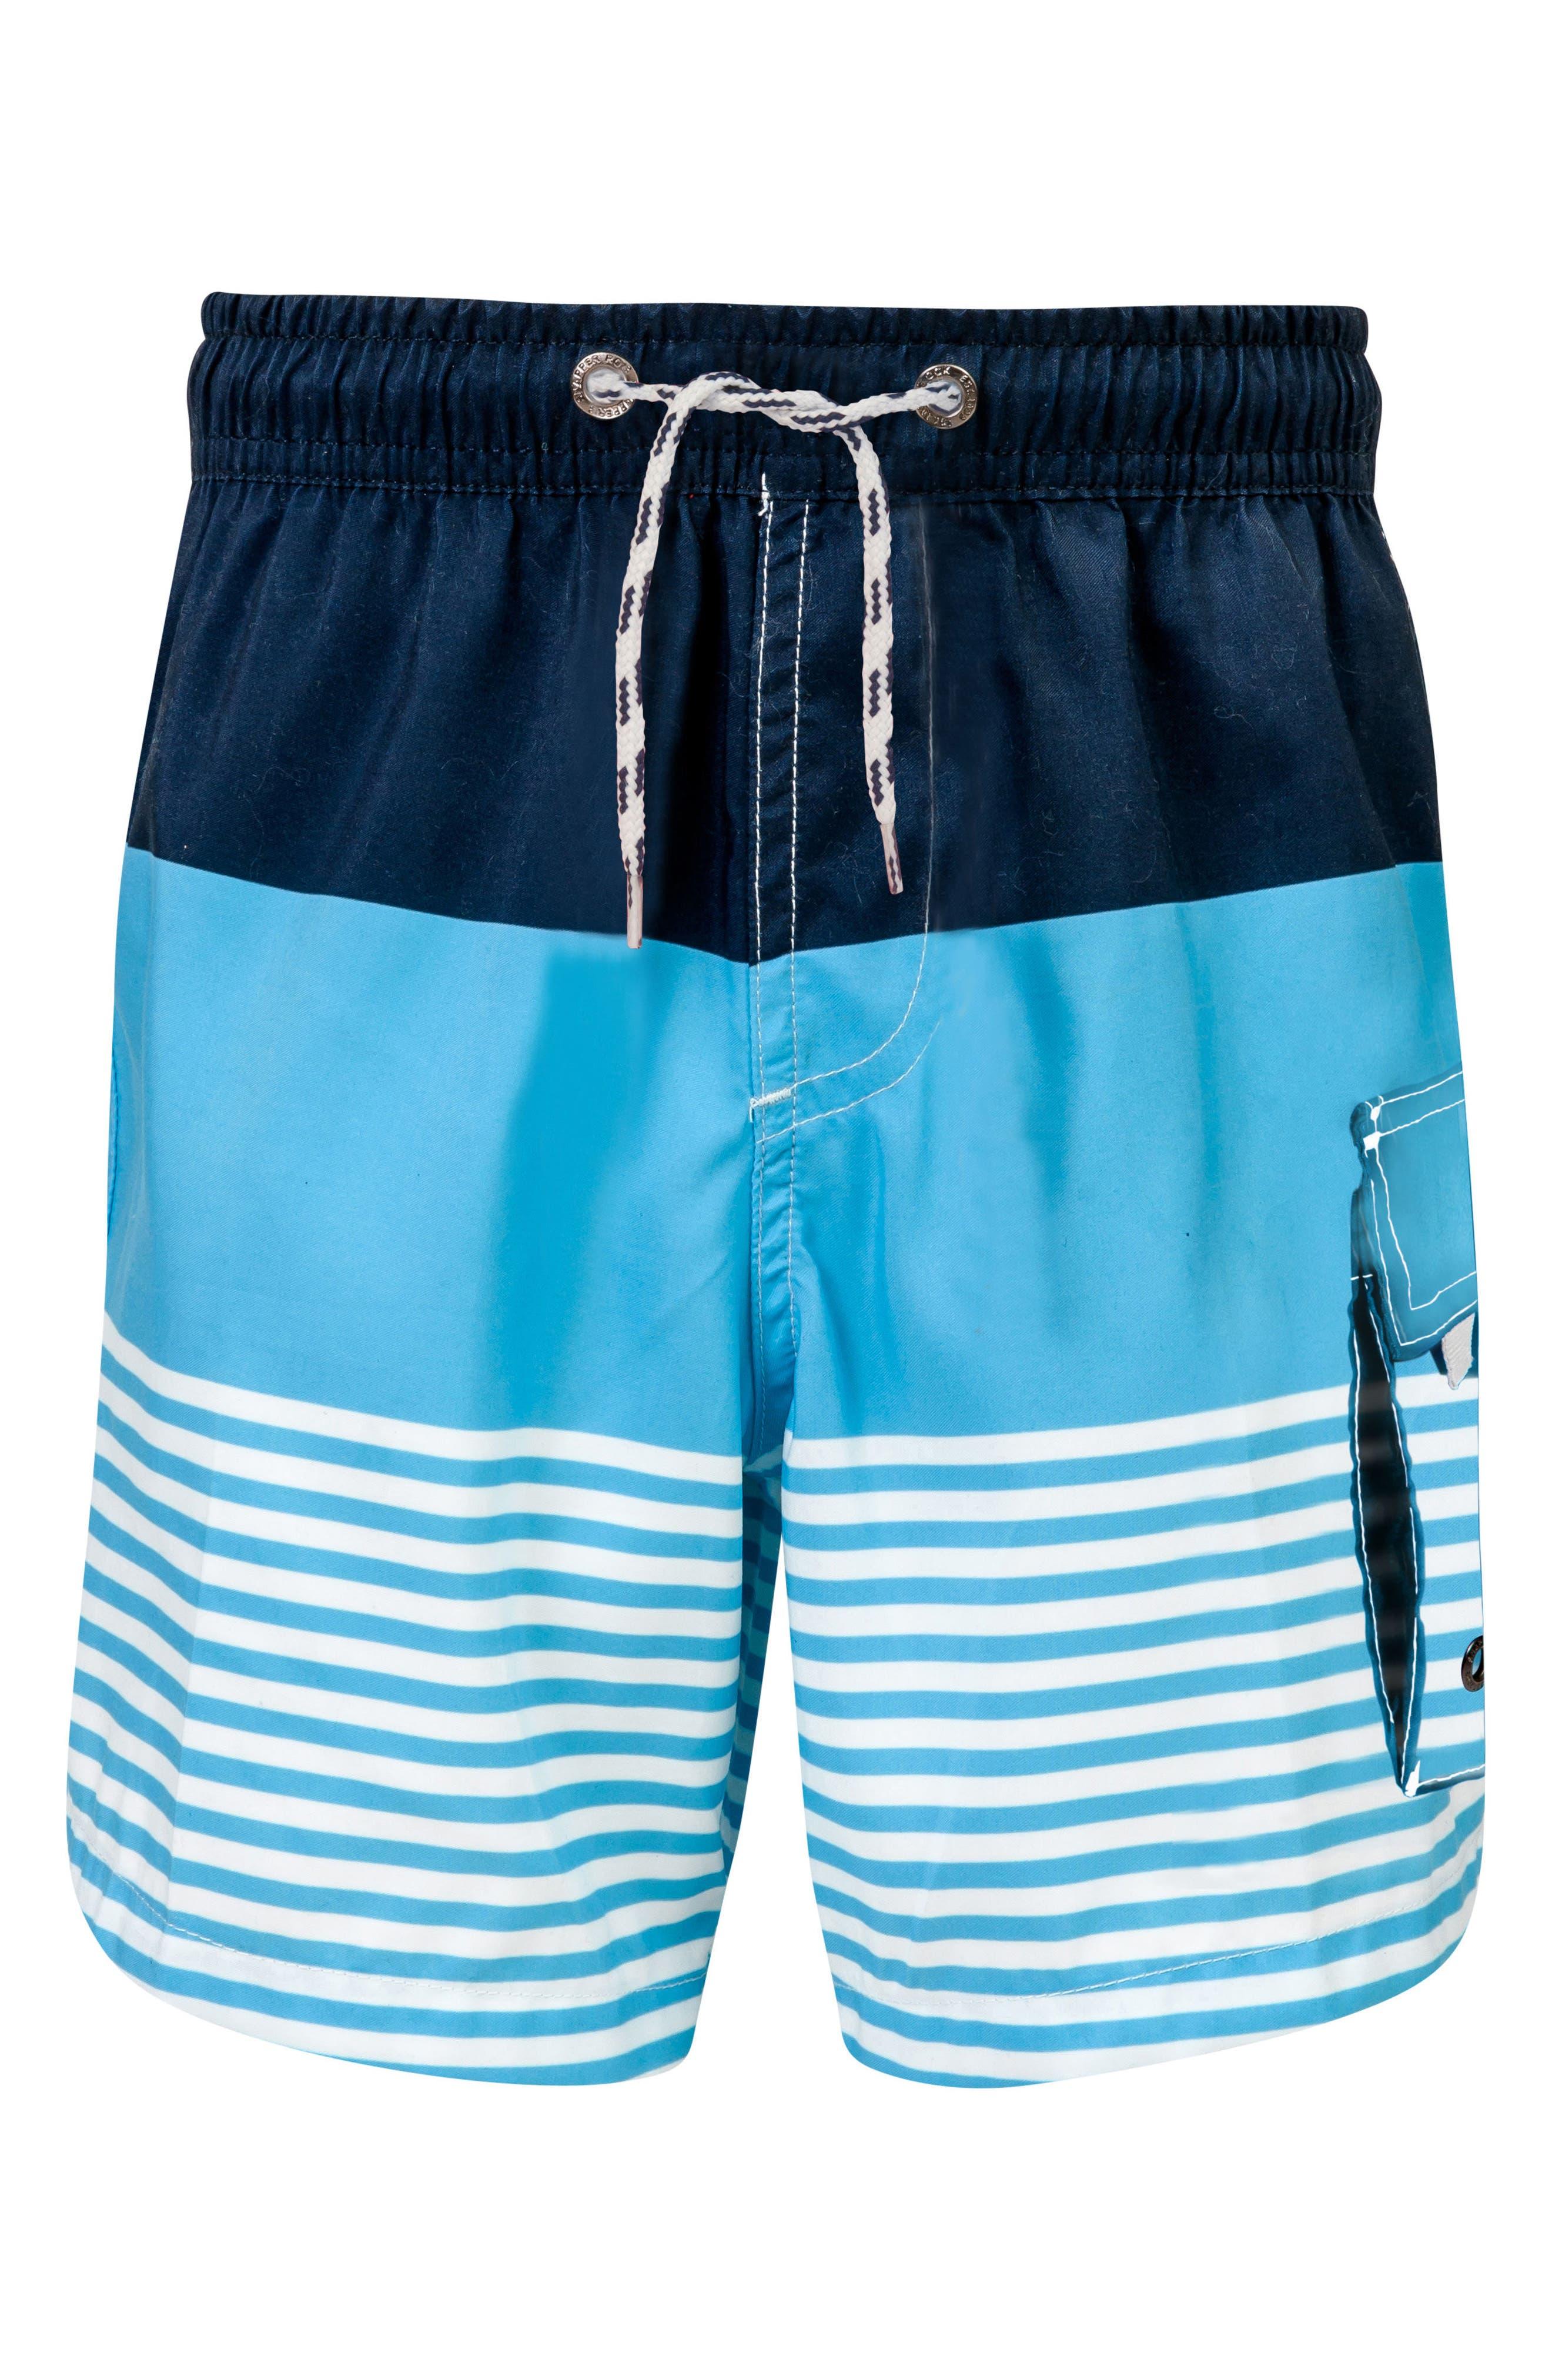 Stripe Board Shorts,                             Main thumbnail 1, color,                             Navy/ Light Blue/ White